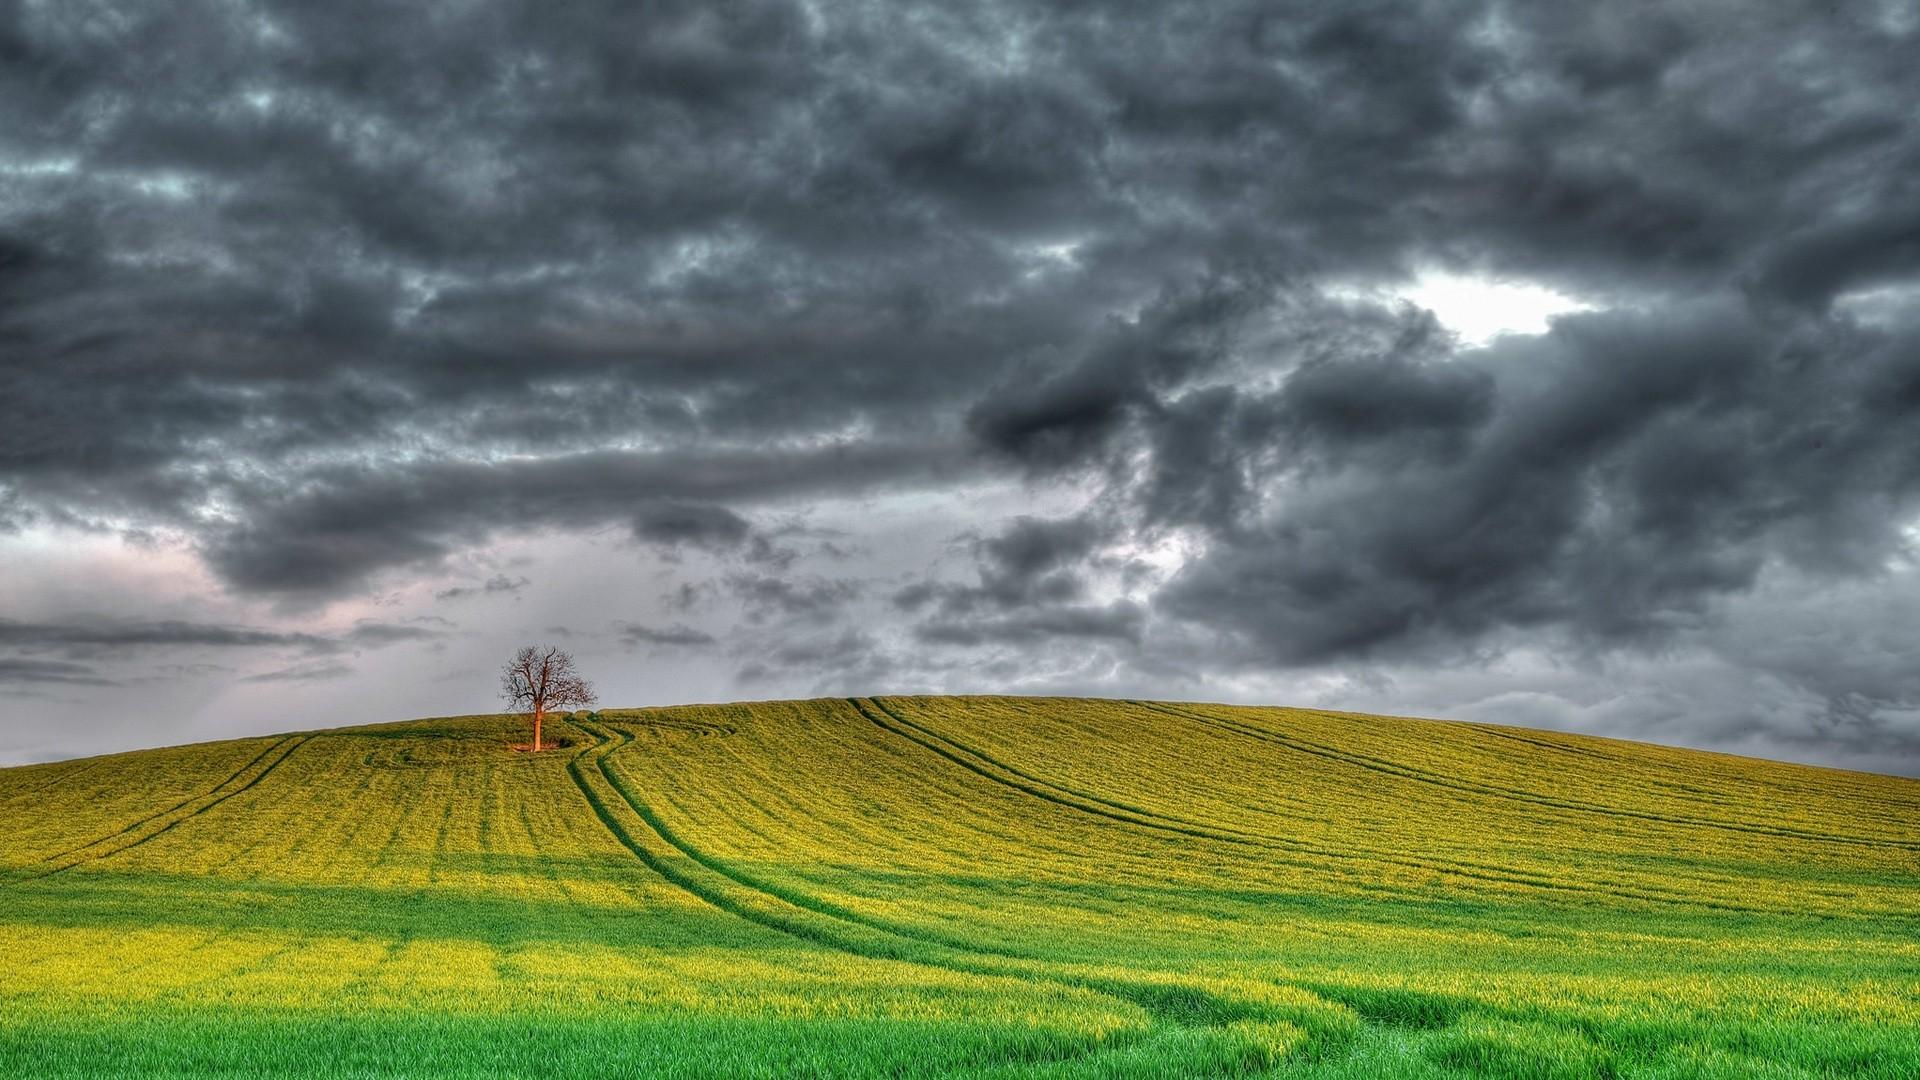 поле природа тучи бесплатно